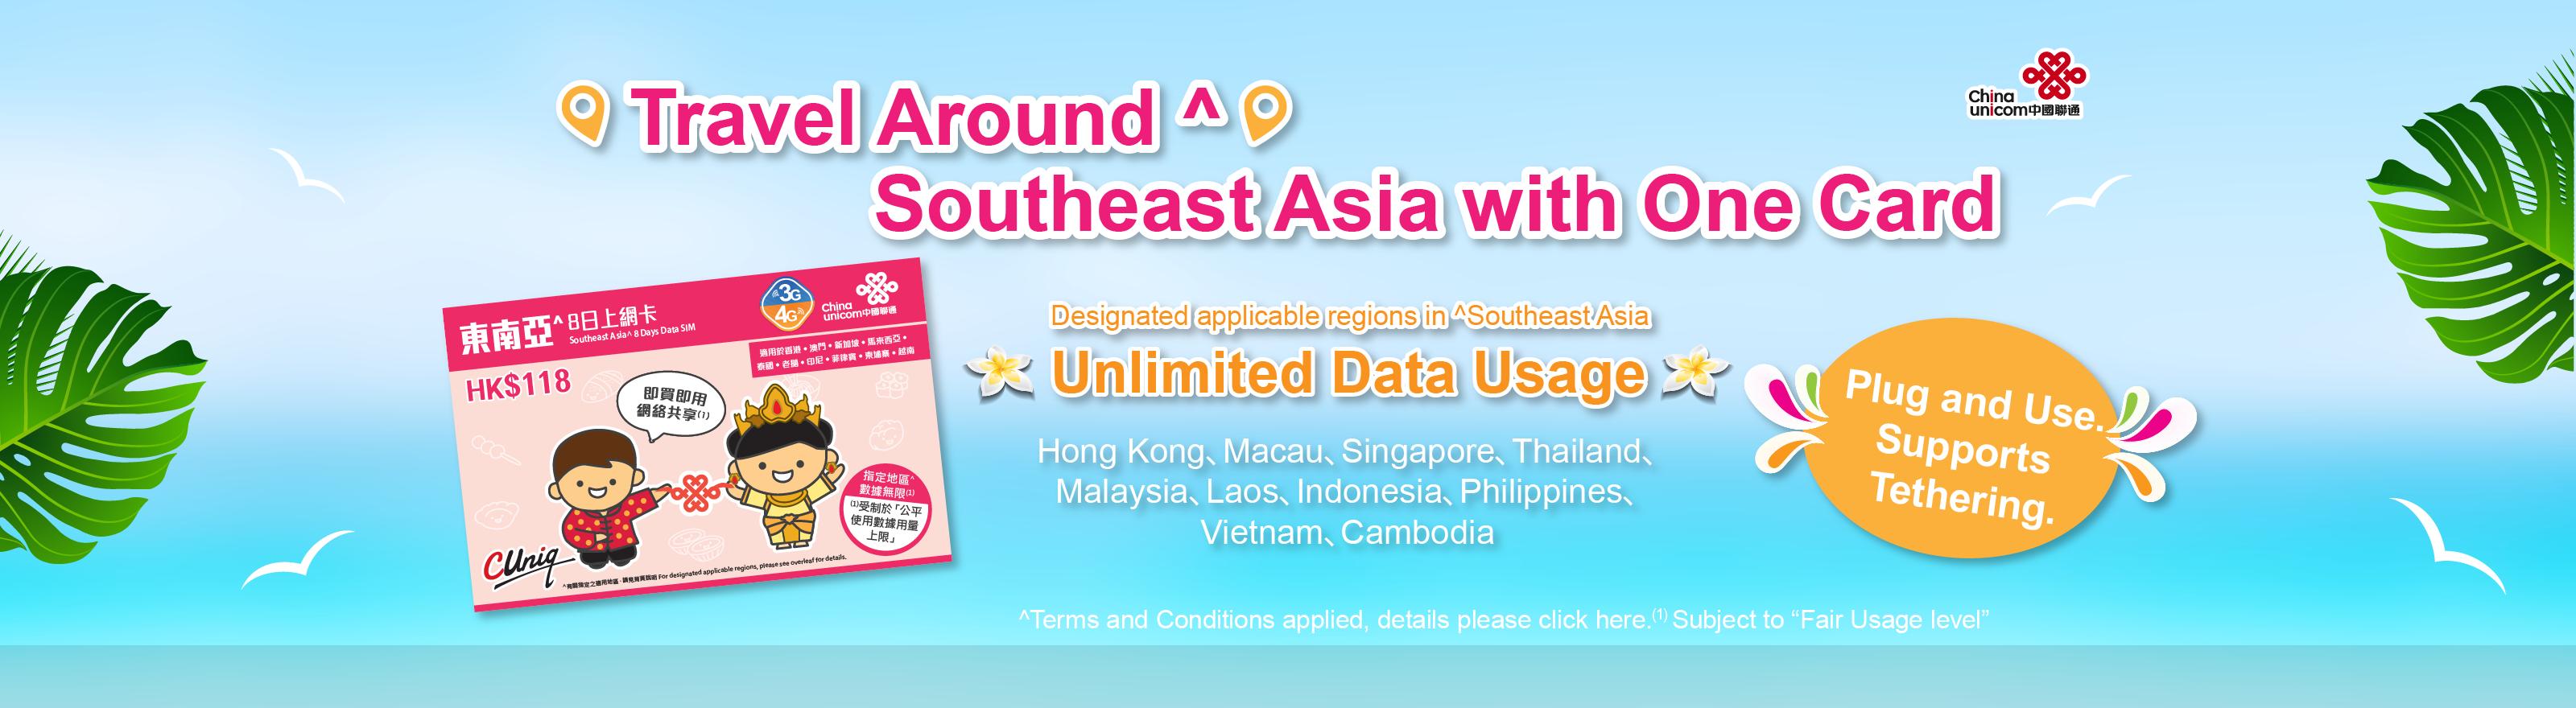 Welcome To China Unicom Hong Kong Online Shop Sim Card Hongkong 10 Days 4g Fup 5gb English